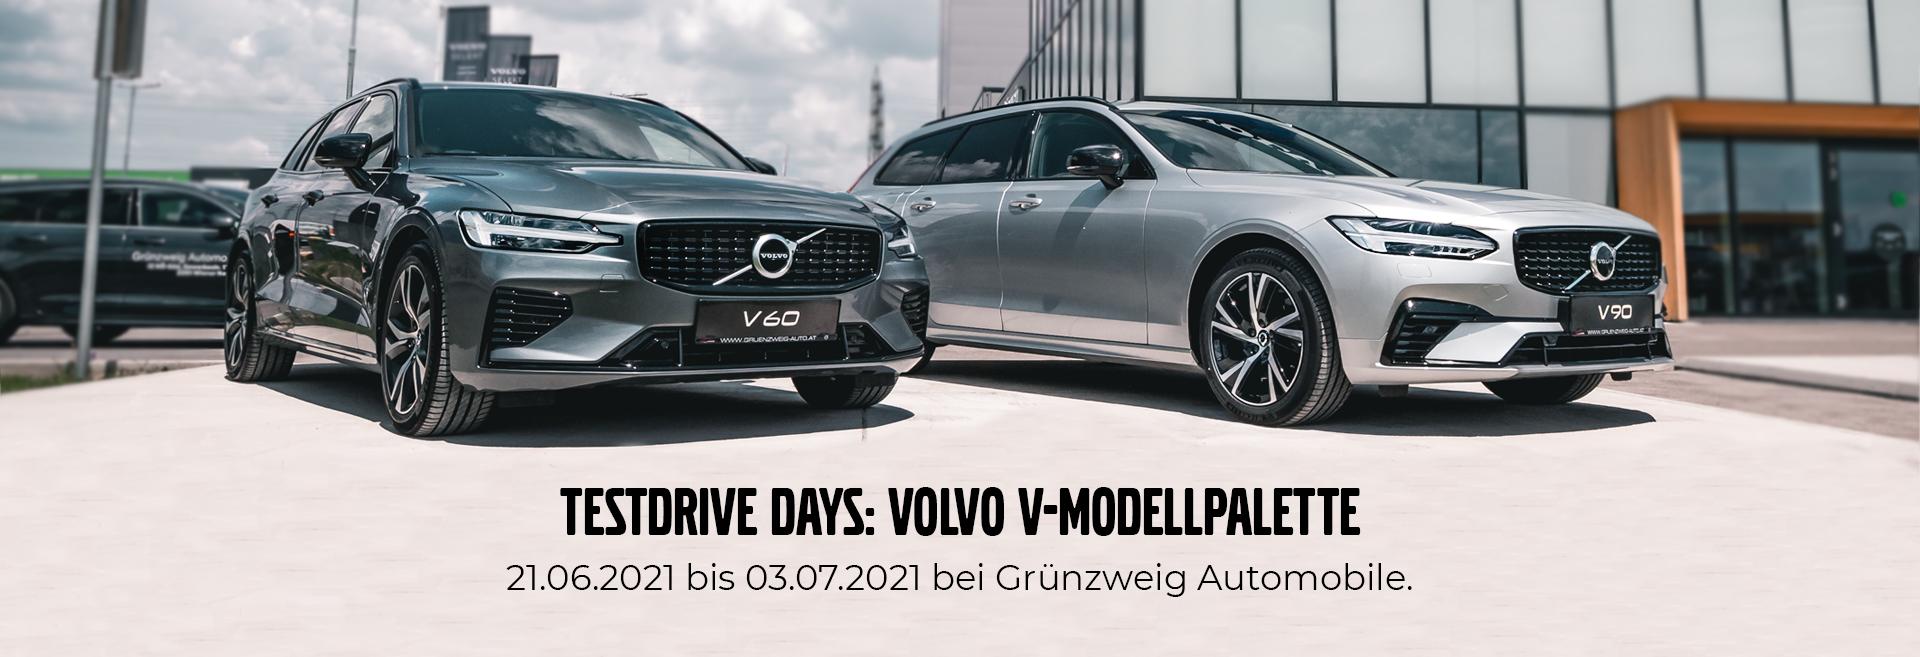 Volvo Testdrive Days